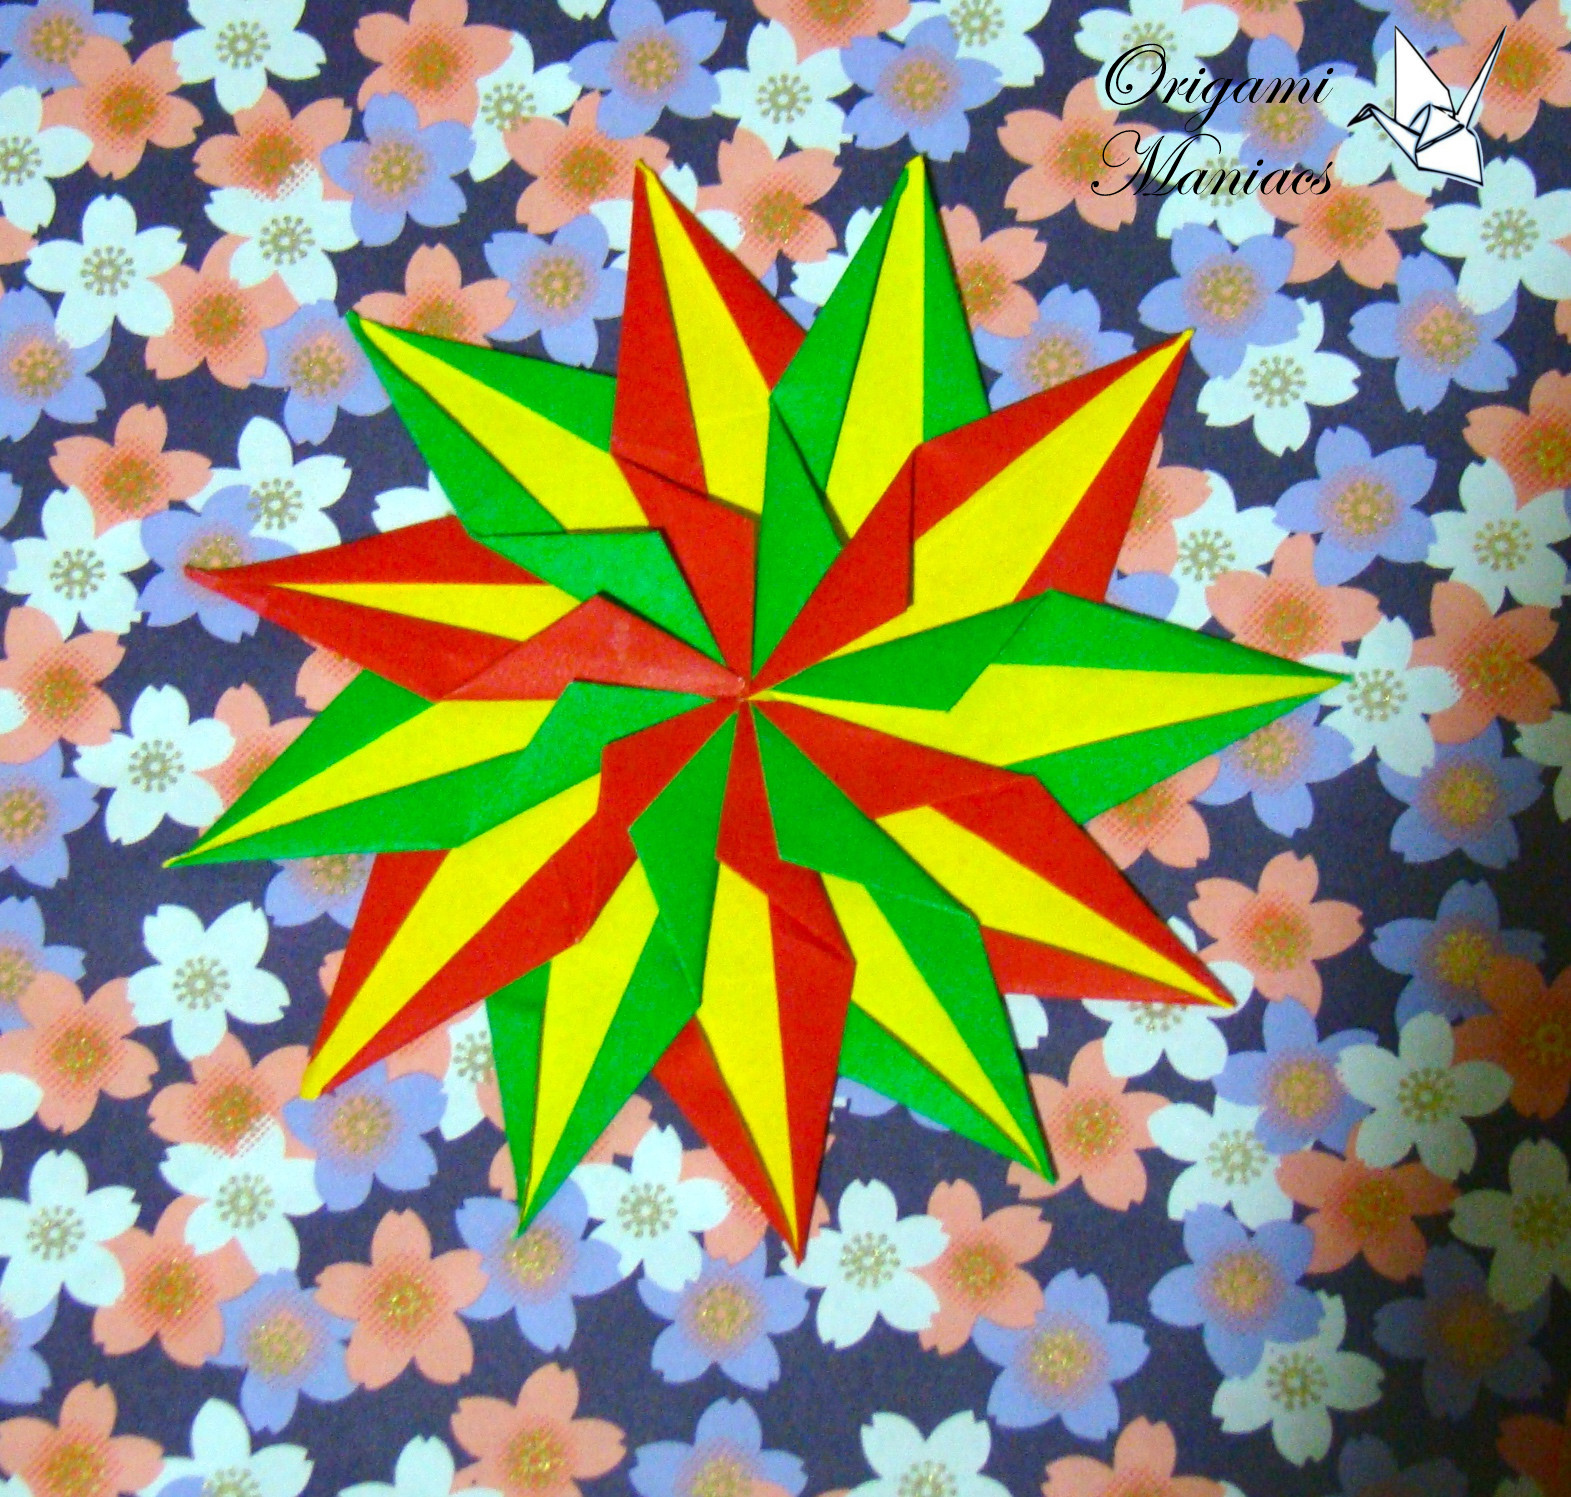 Origami maniacs origami mandalas for christmas trees - Arbol de navidad origami ...